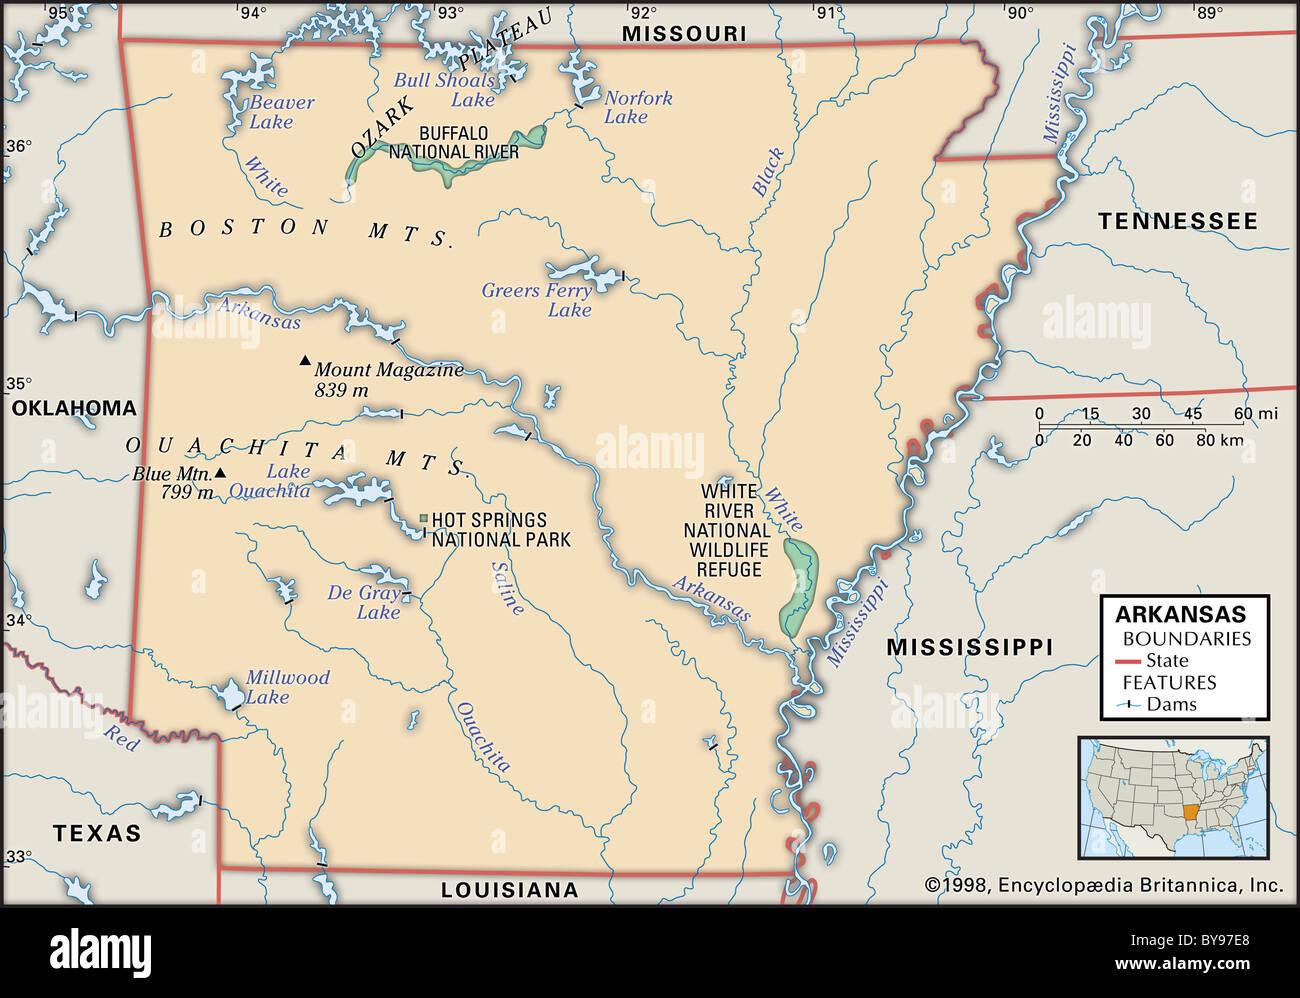 Physical Map Of Arkansas Stock Photo Royalty Free Image - Arkansas physical map